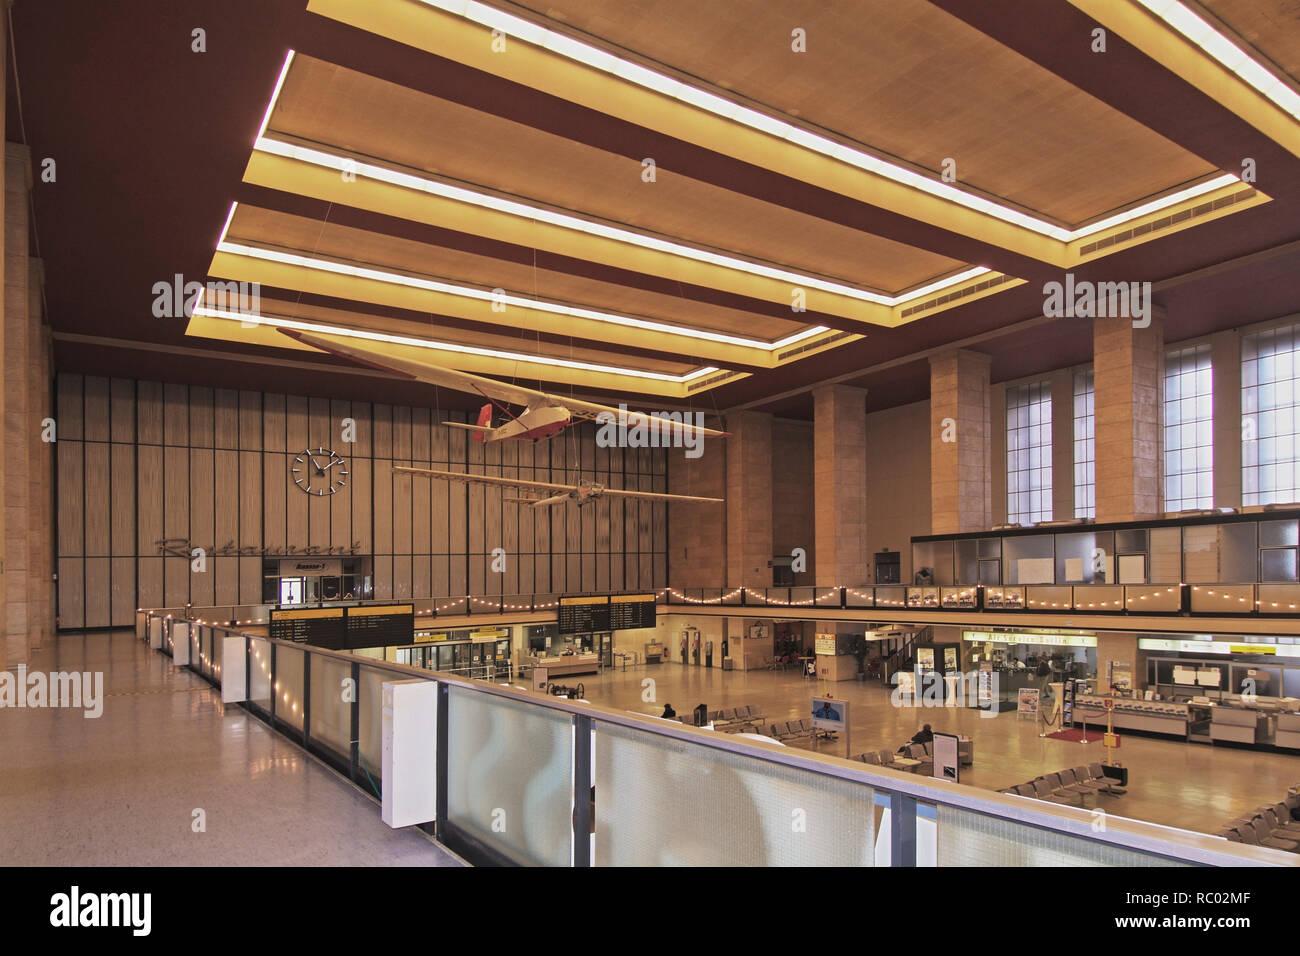 Flughafen Tempelhof, Abfertigungshalle, Berlin, Deutschland, Europa | Tempelhof airport, terminal building, Berlin, Germany, Europe - Stock Image